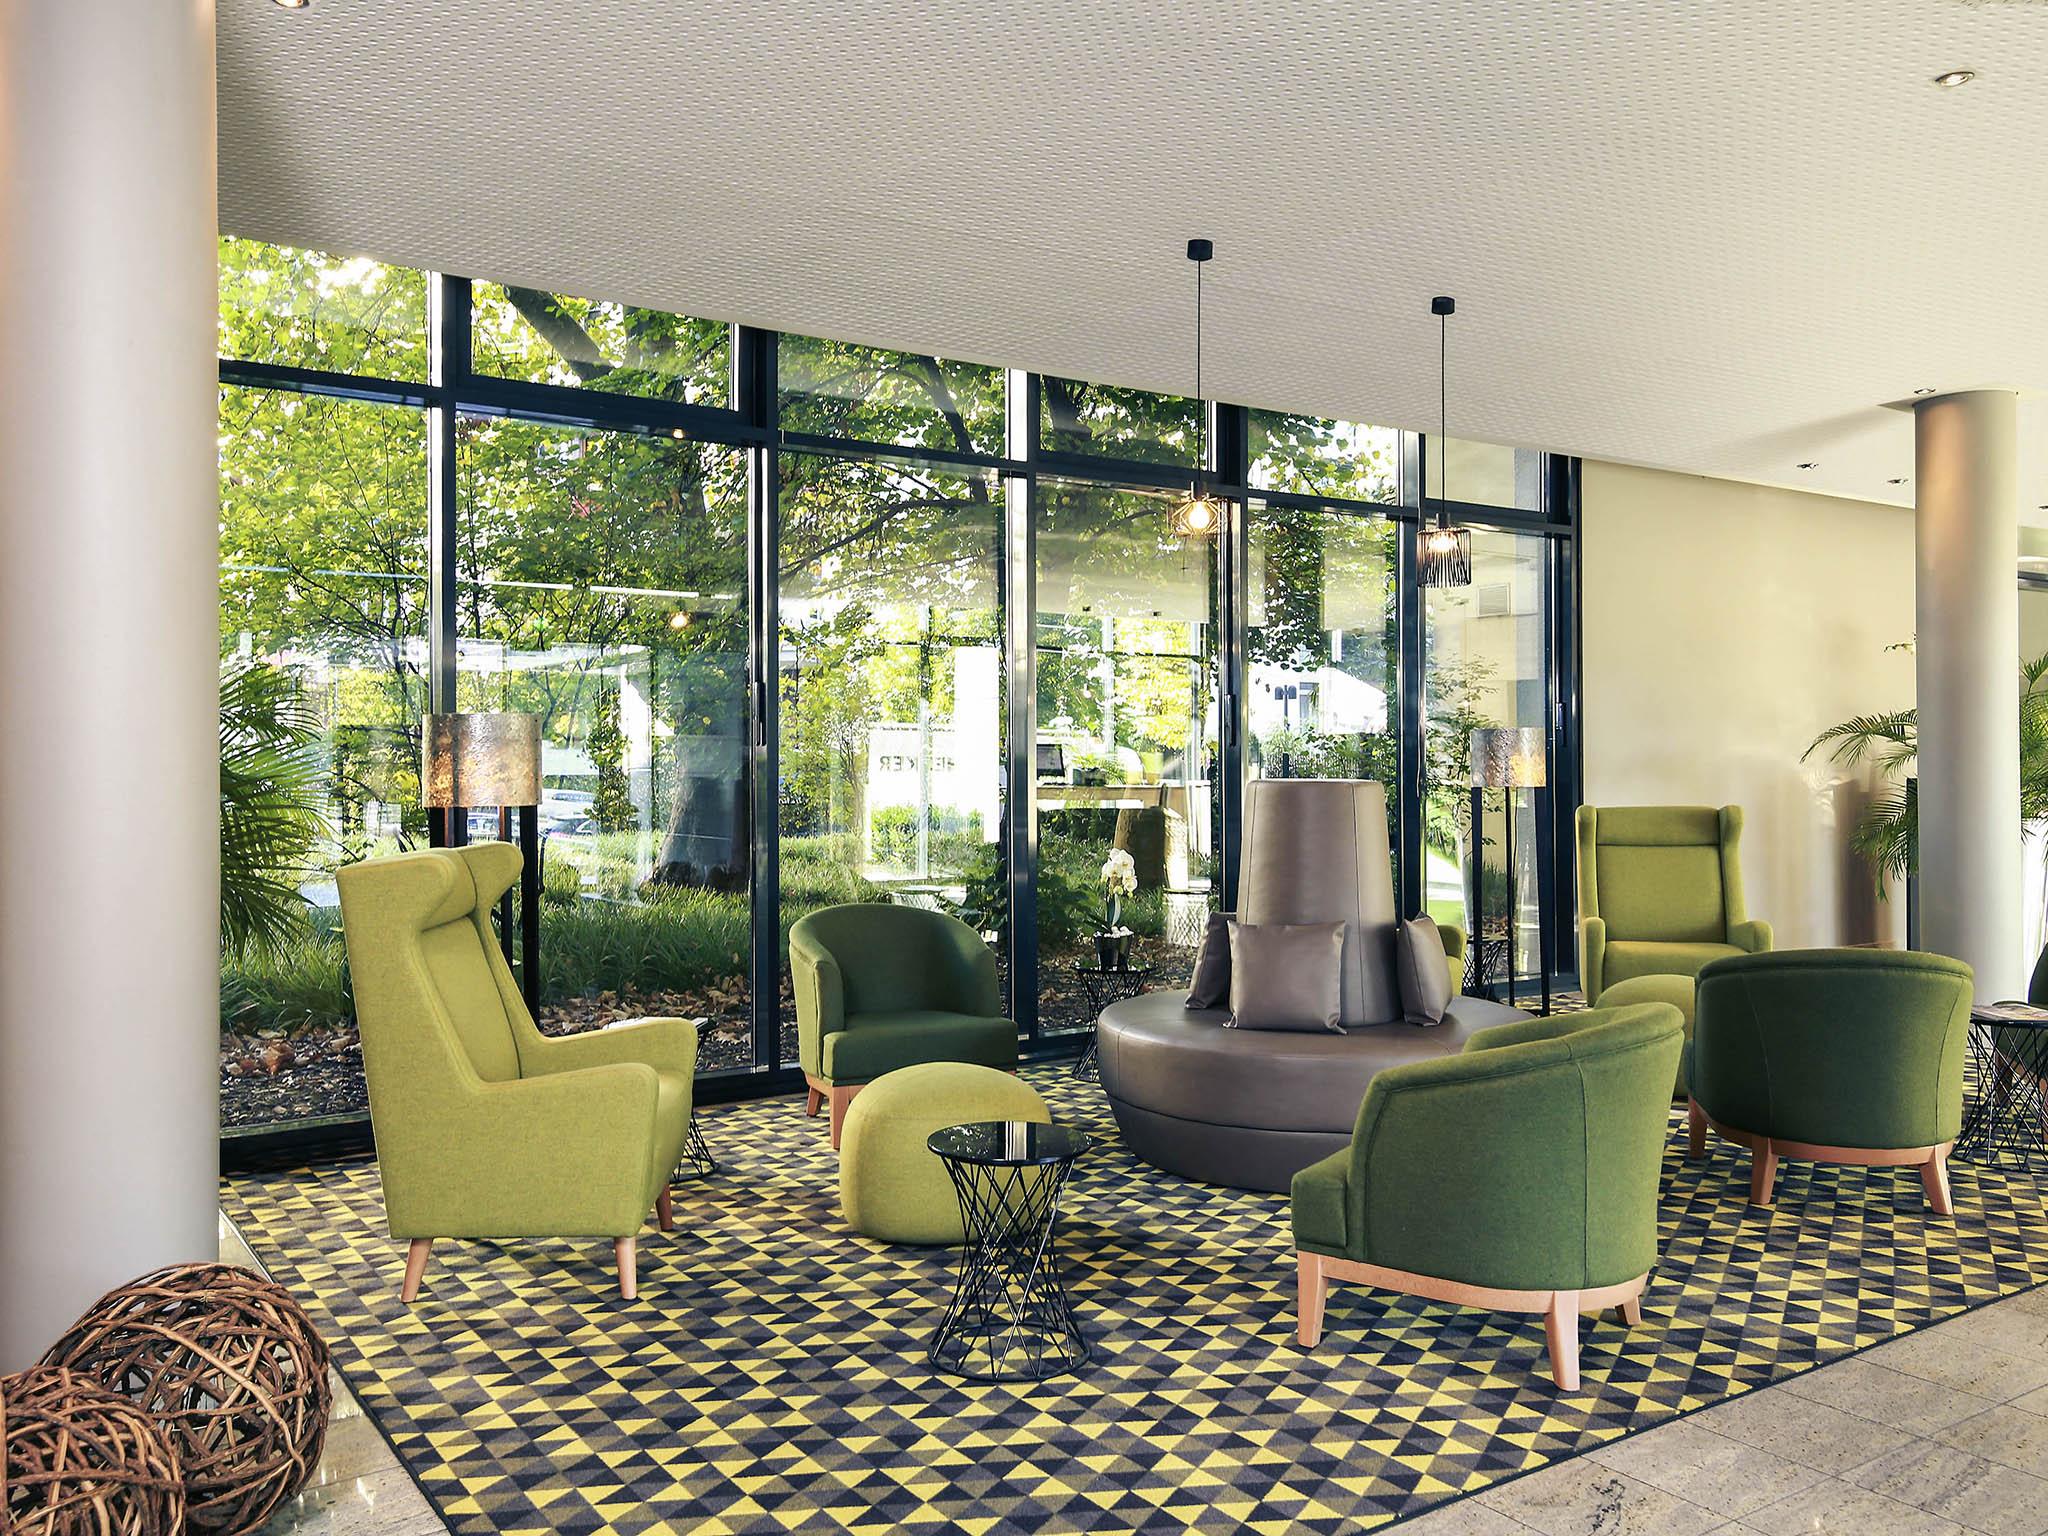 Mercure Hotel Essen Plaza